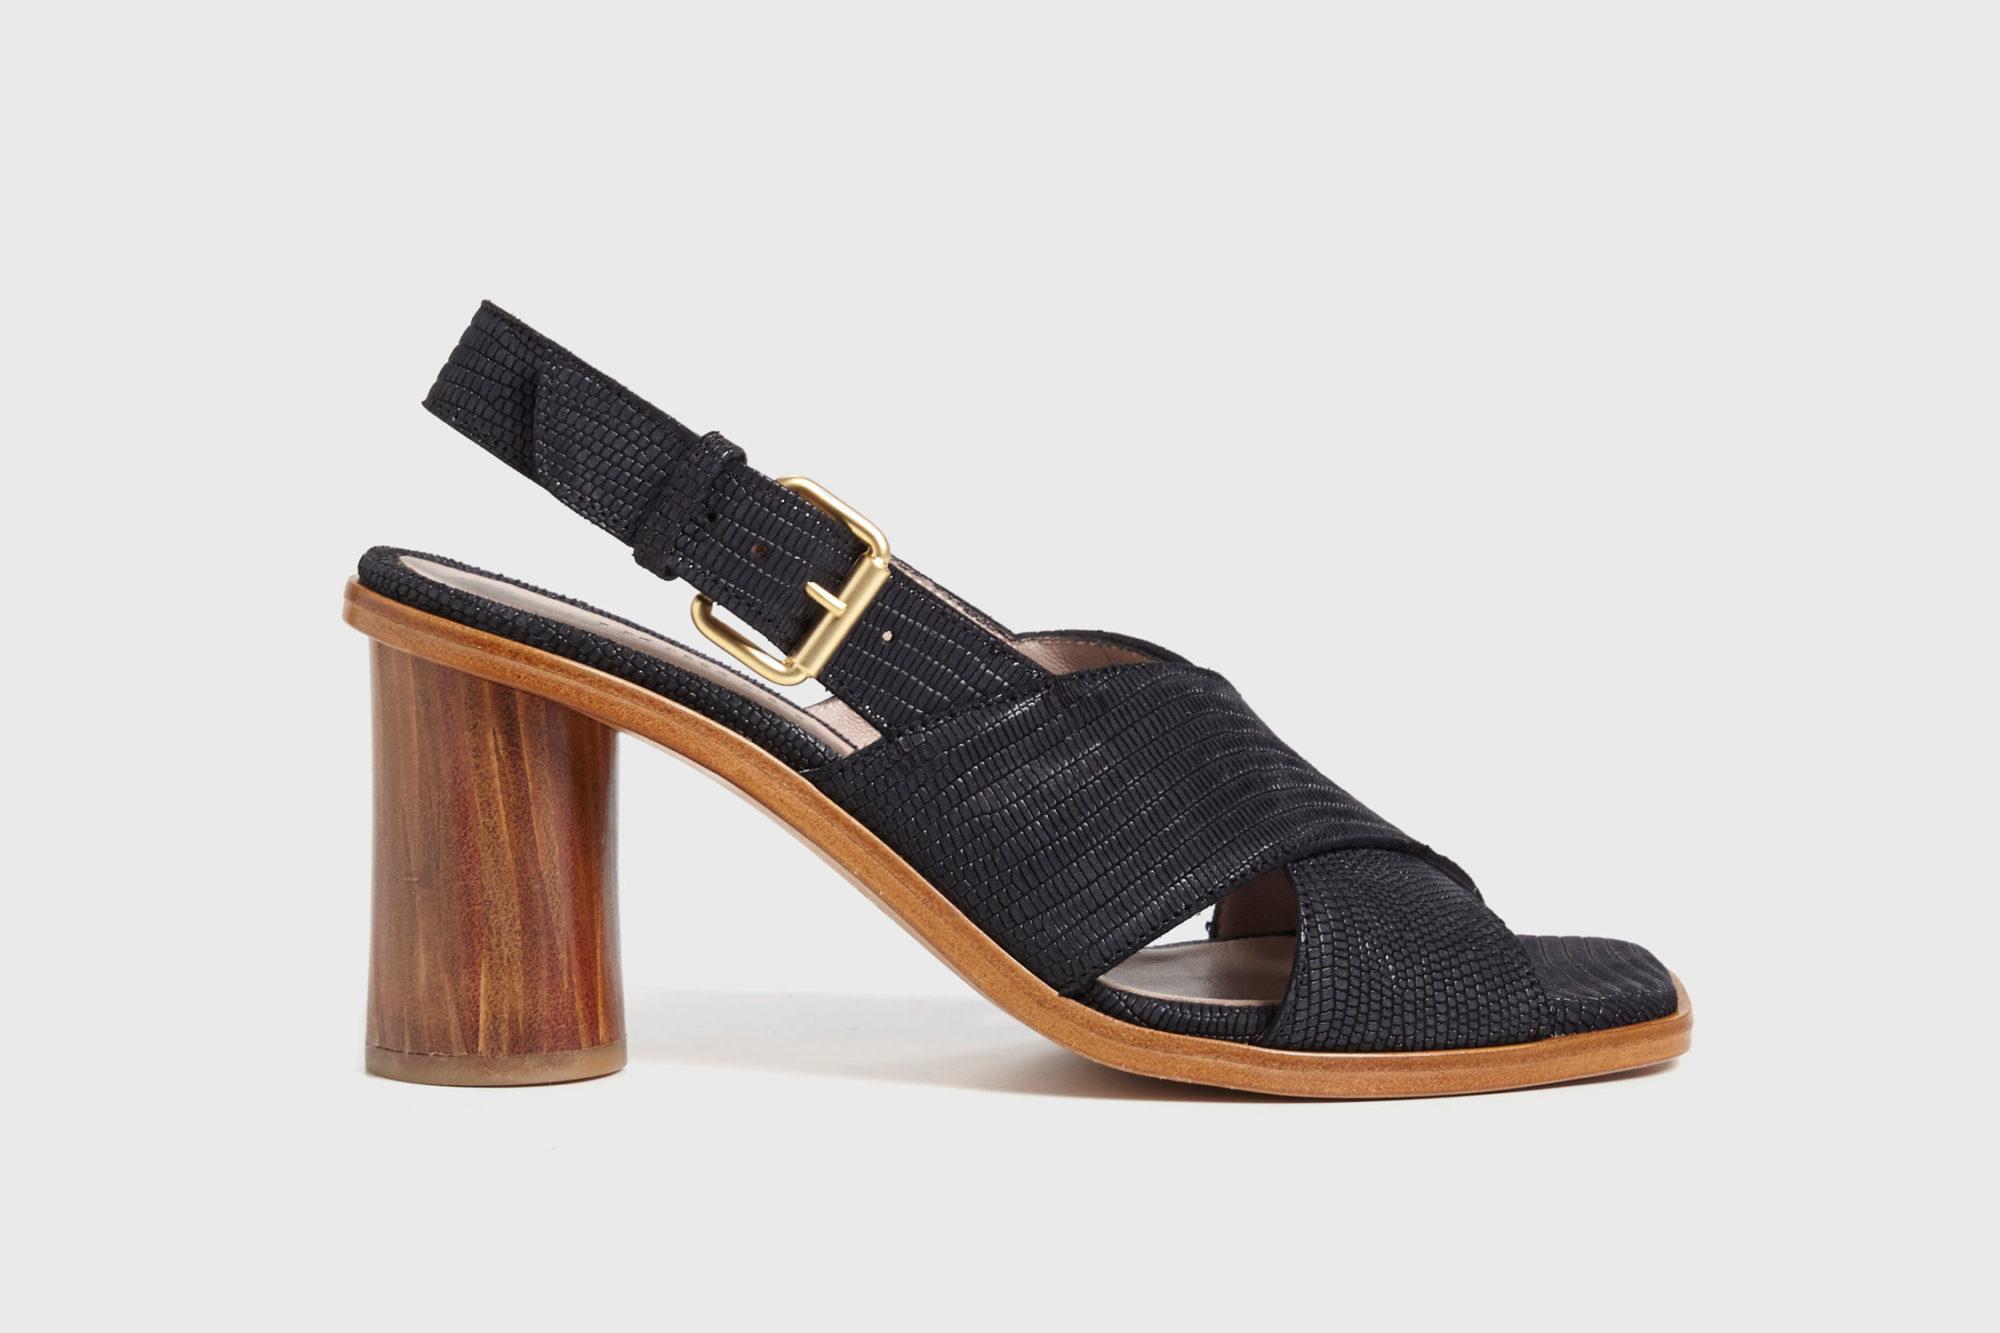 Dorotea sandalia de tacón alto jazz negra ss17 perfil